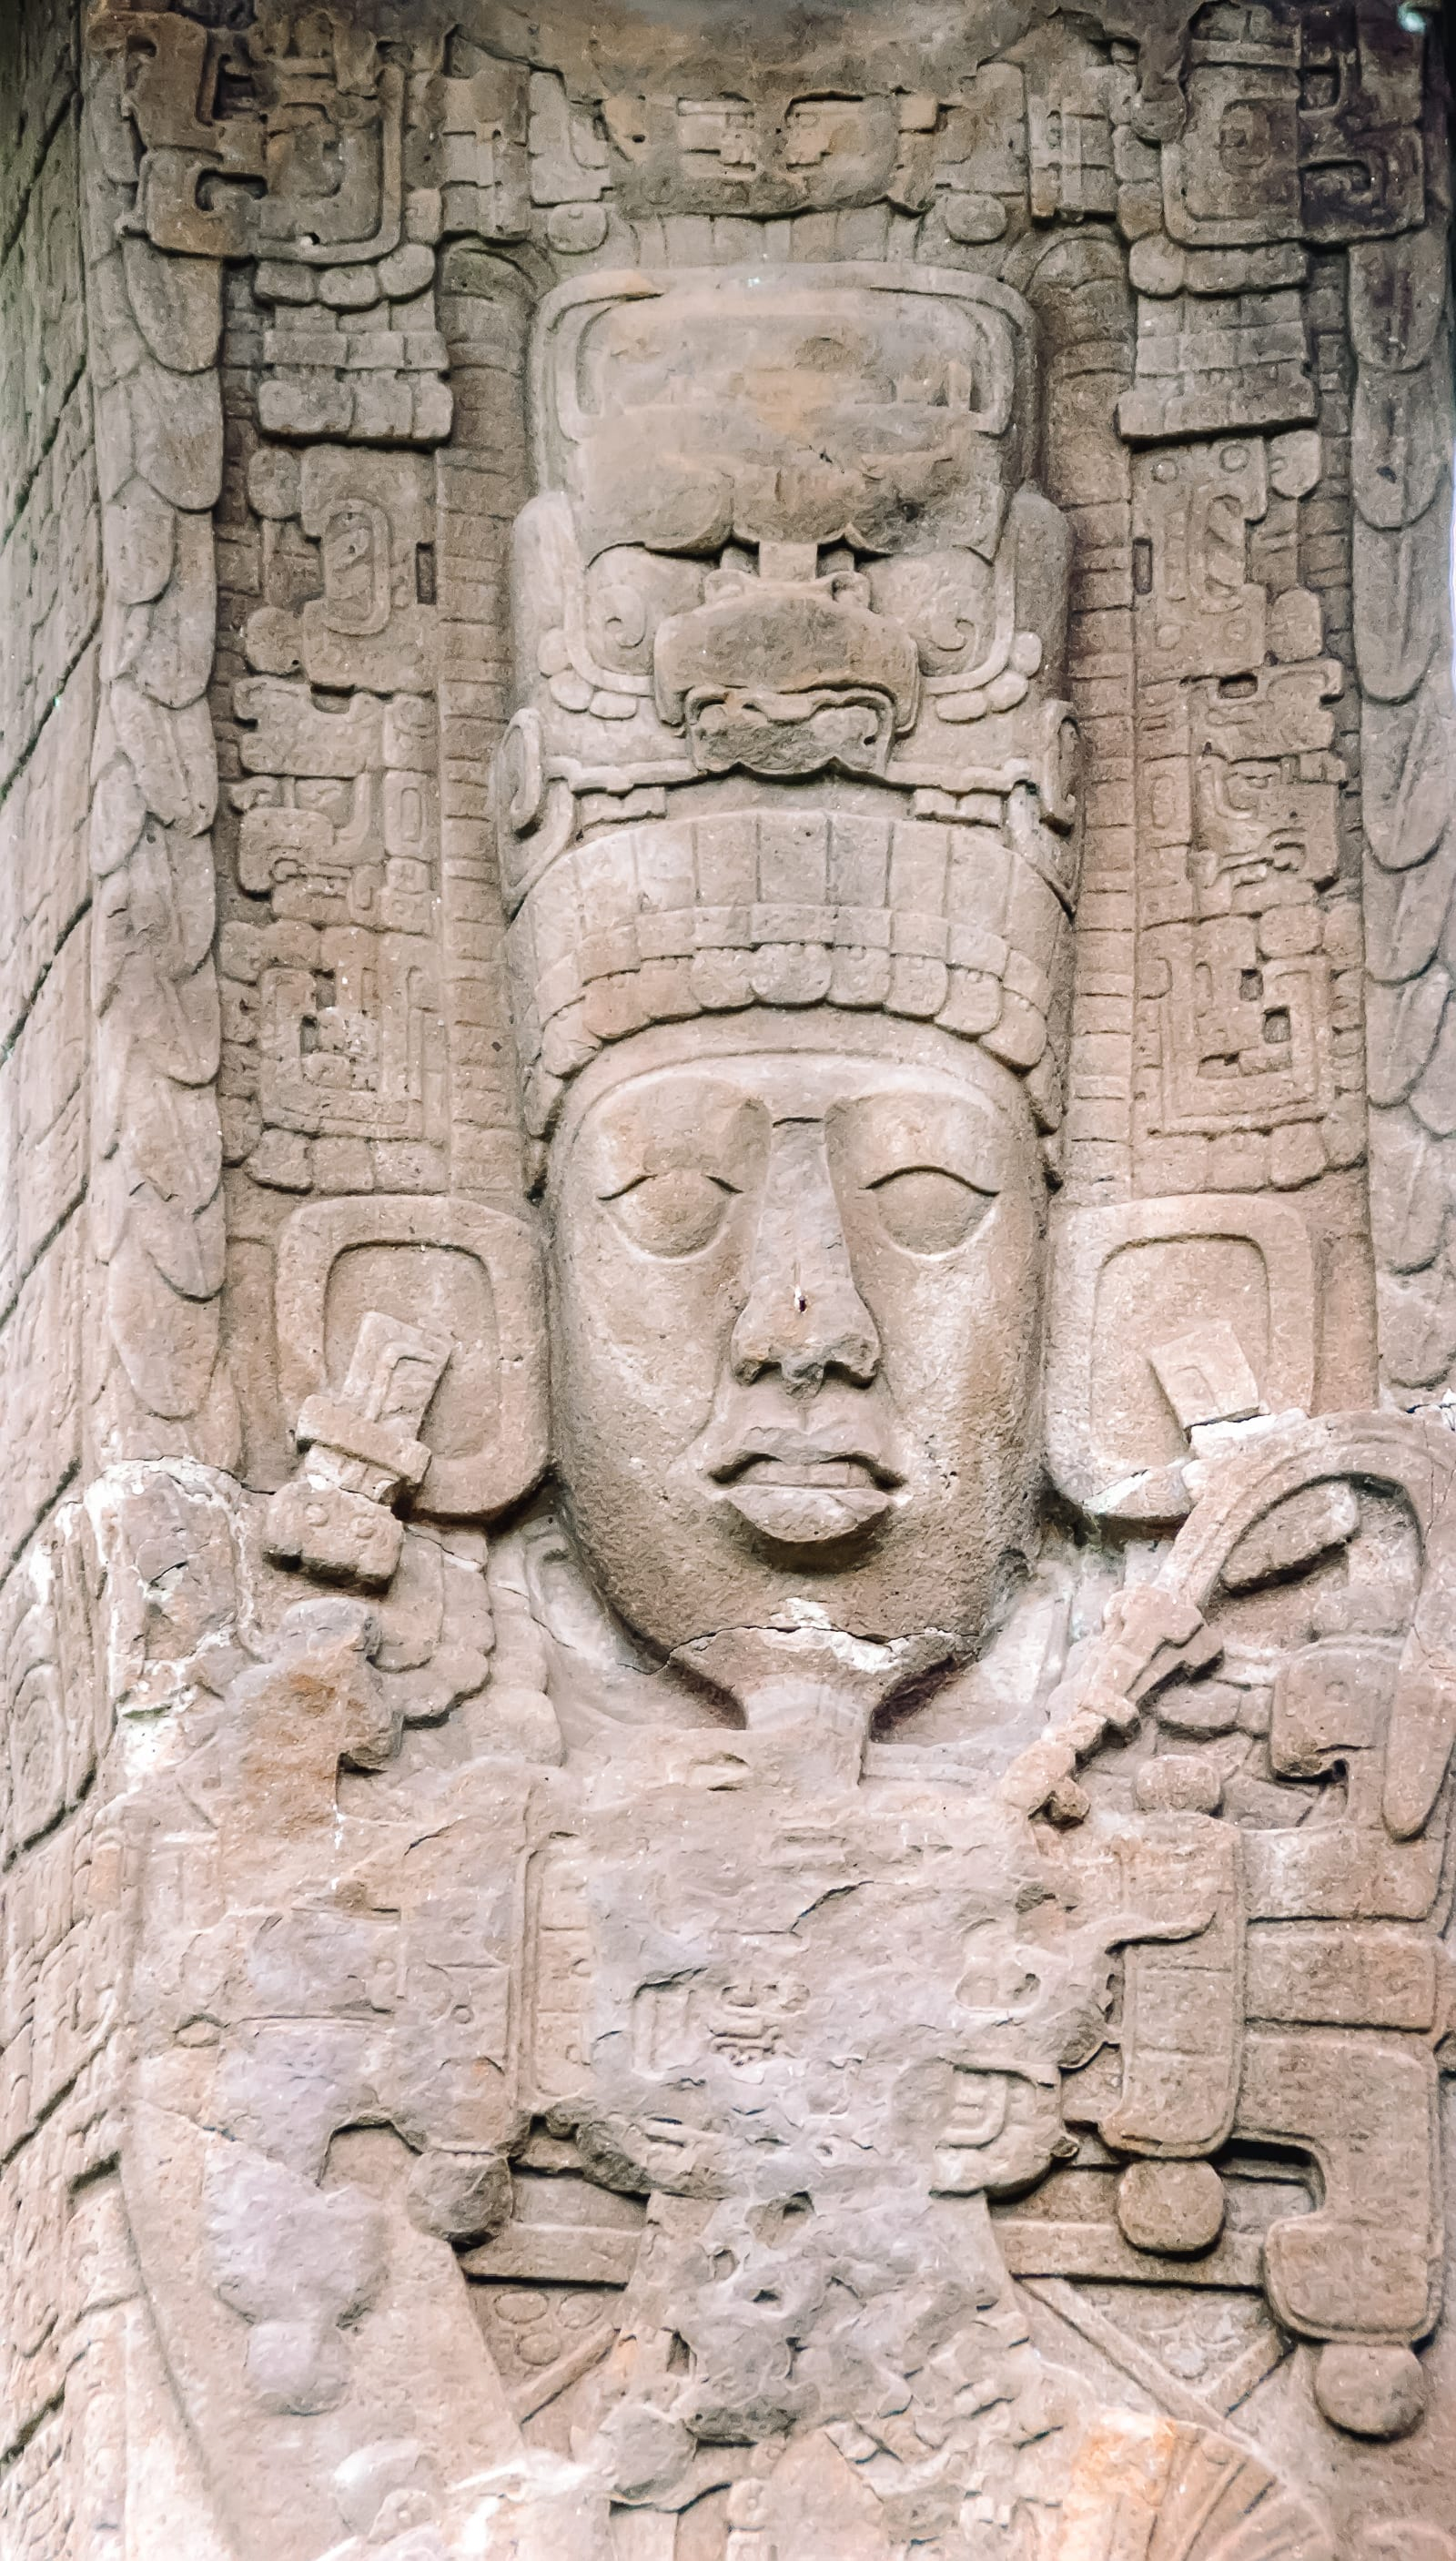 Guatemala Travel: 13 Amazing Mayan Ruins You HAVE To Visit! (7)